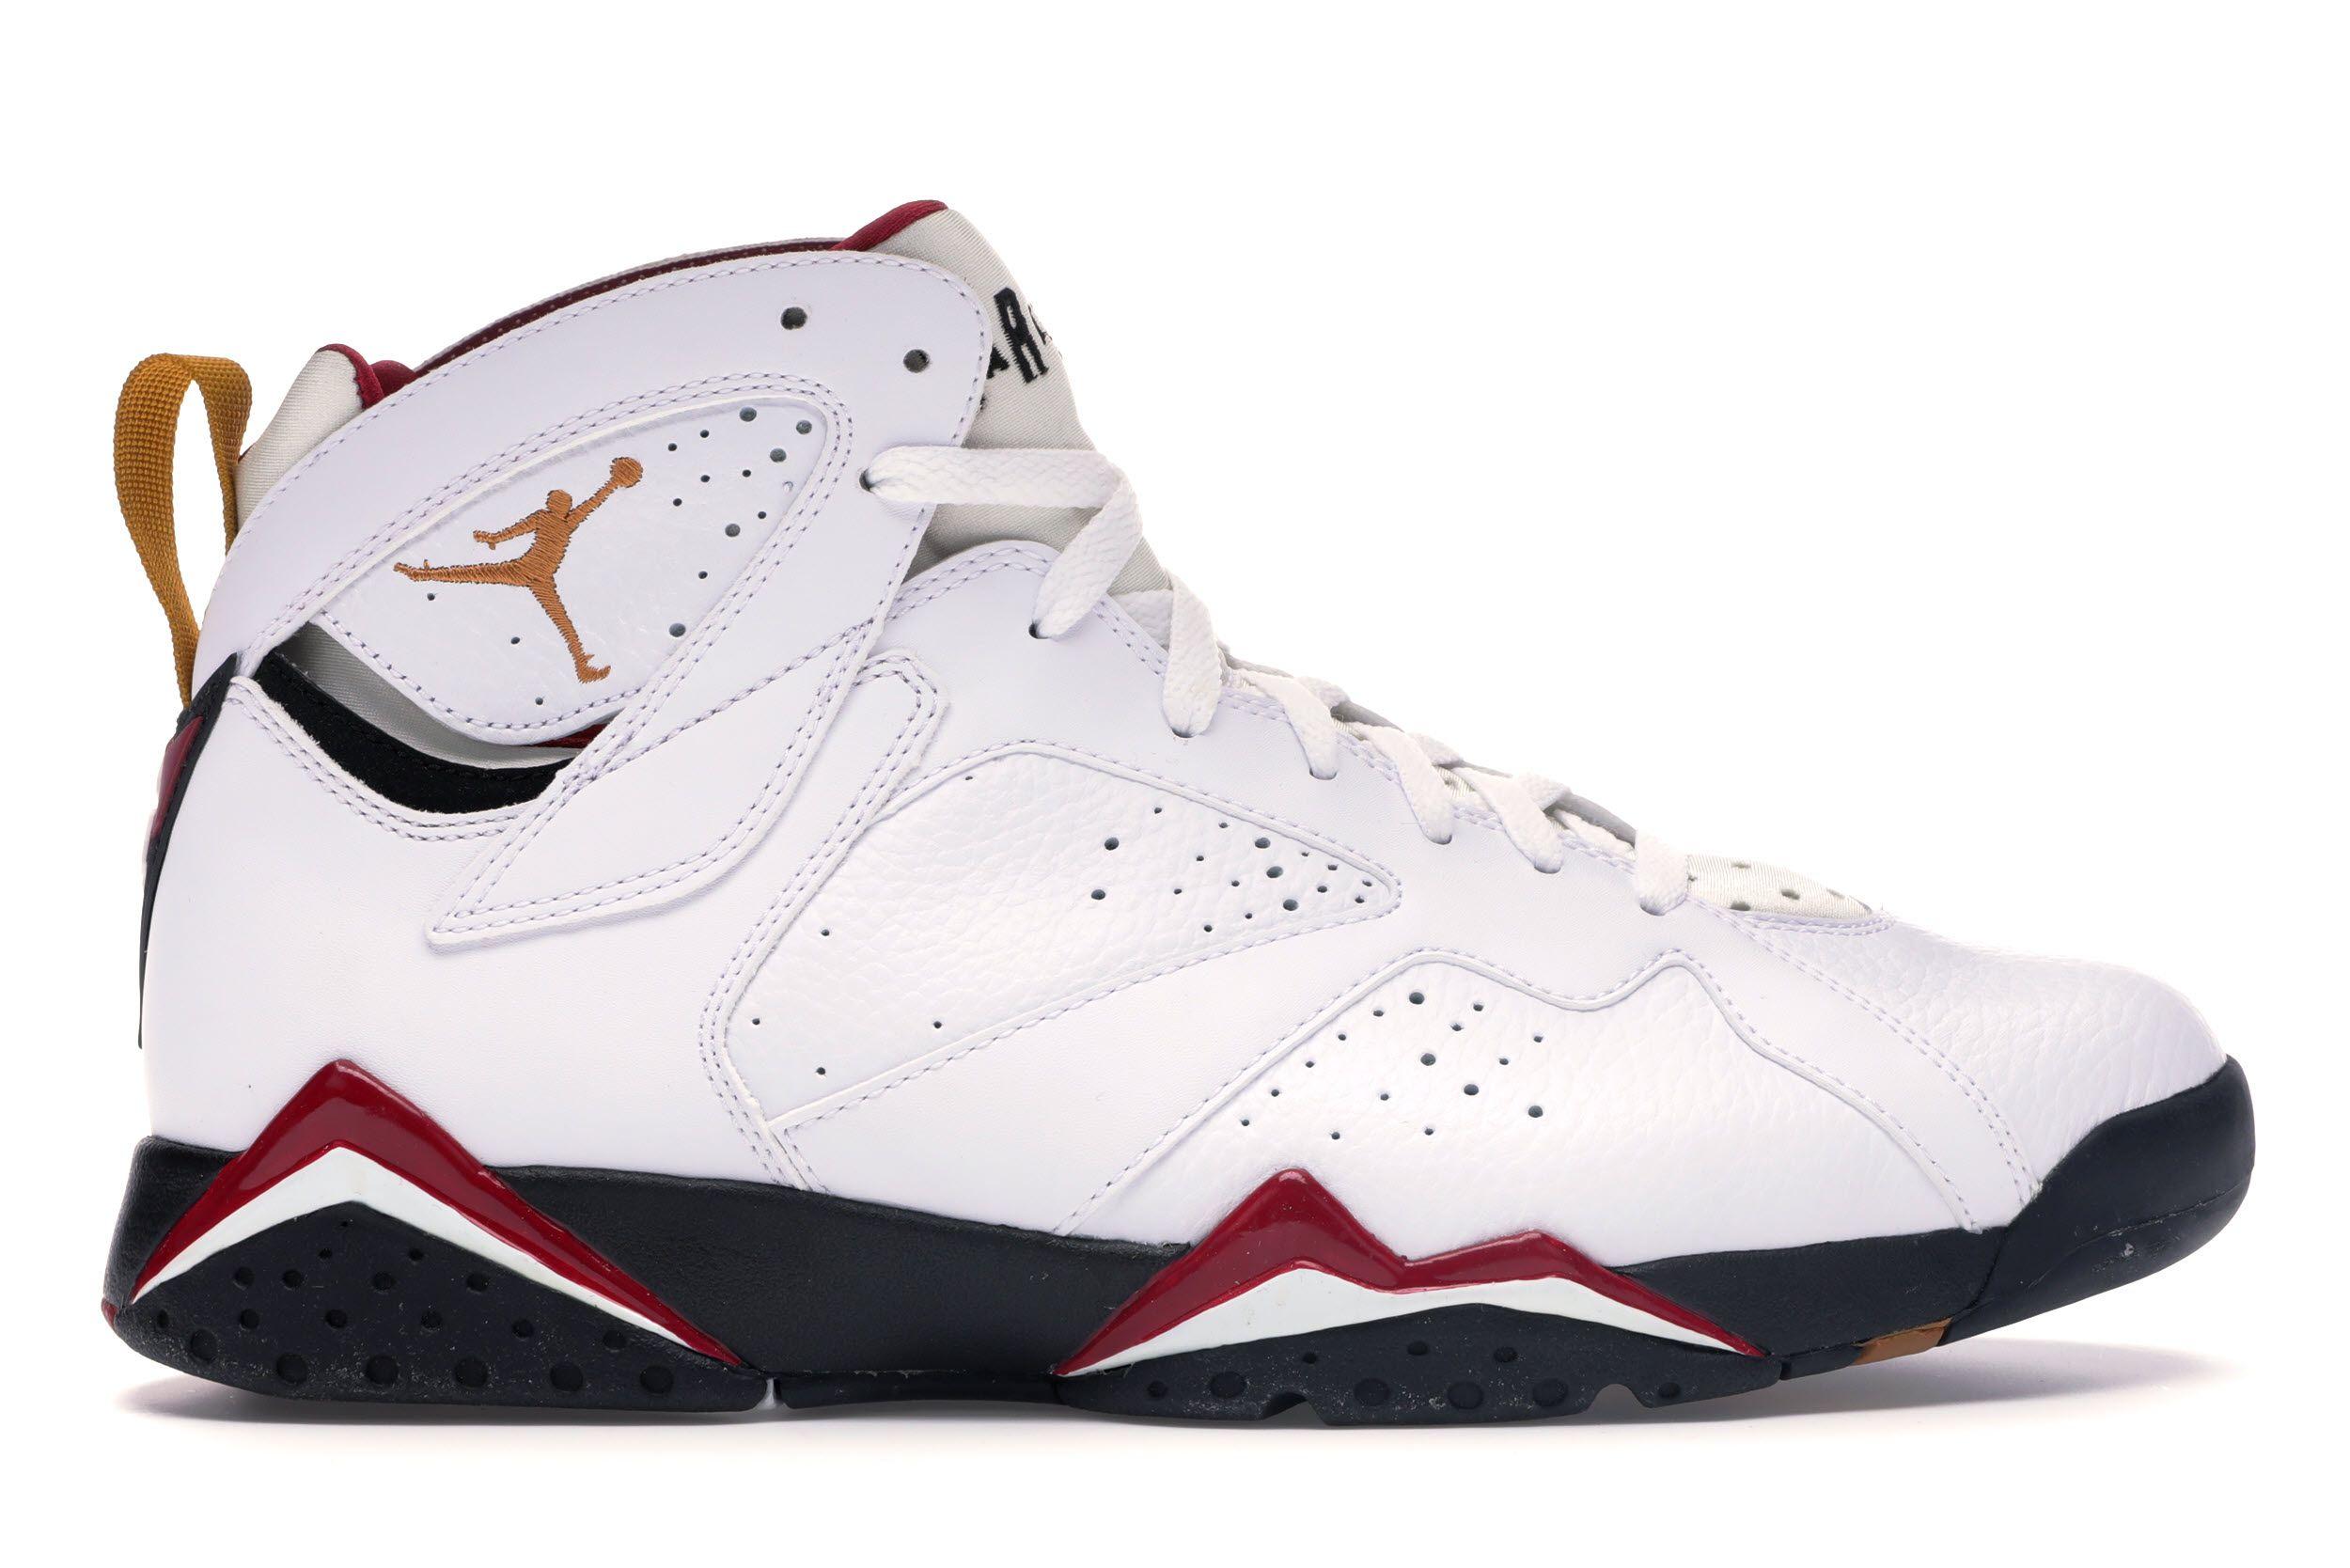 scarpe jordan anni 90,Pulitura metalli www.marketingasya.com